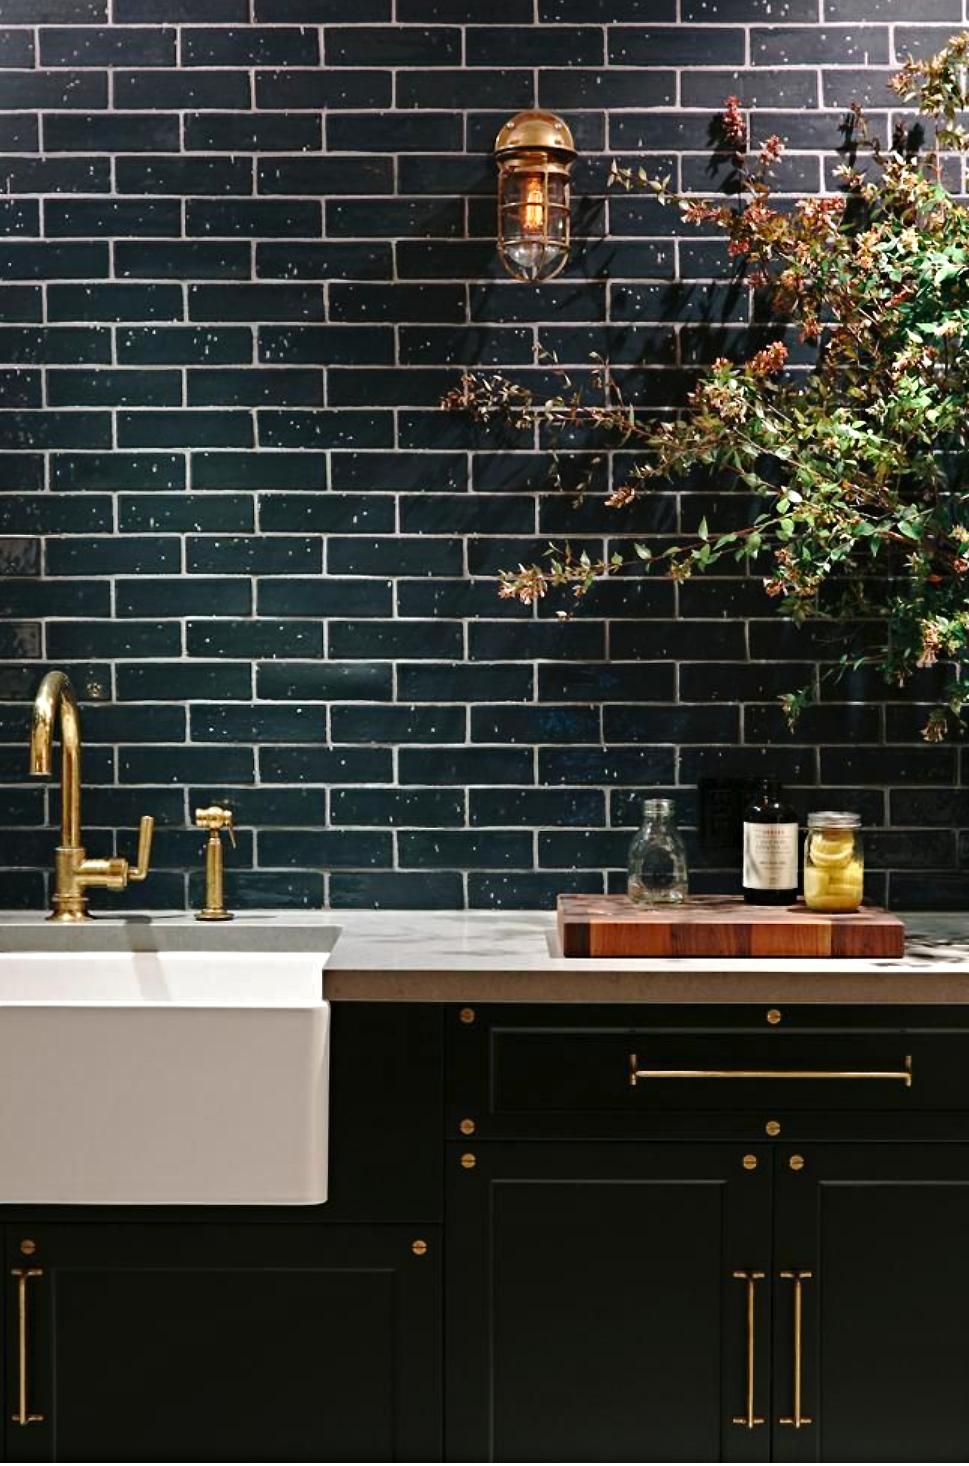 Allumer decor home pinterest subway tiles interiors and